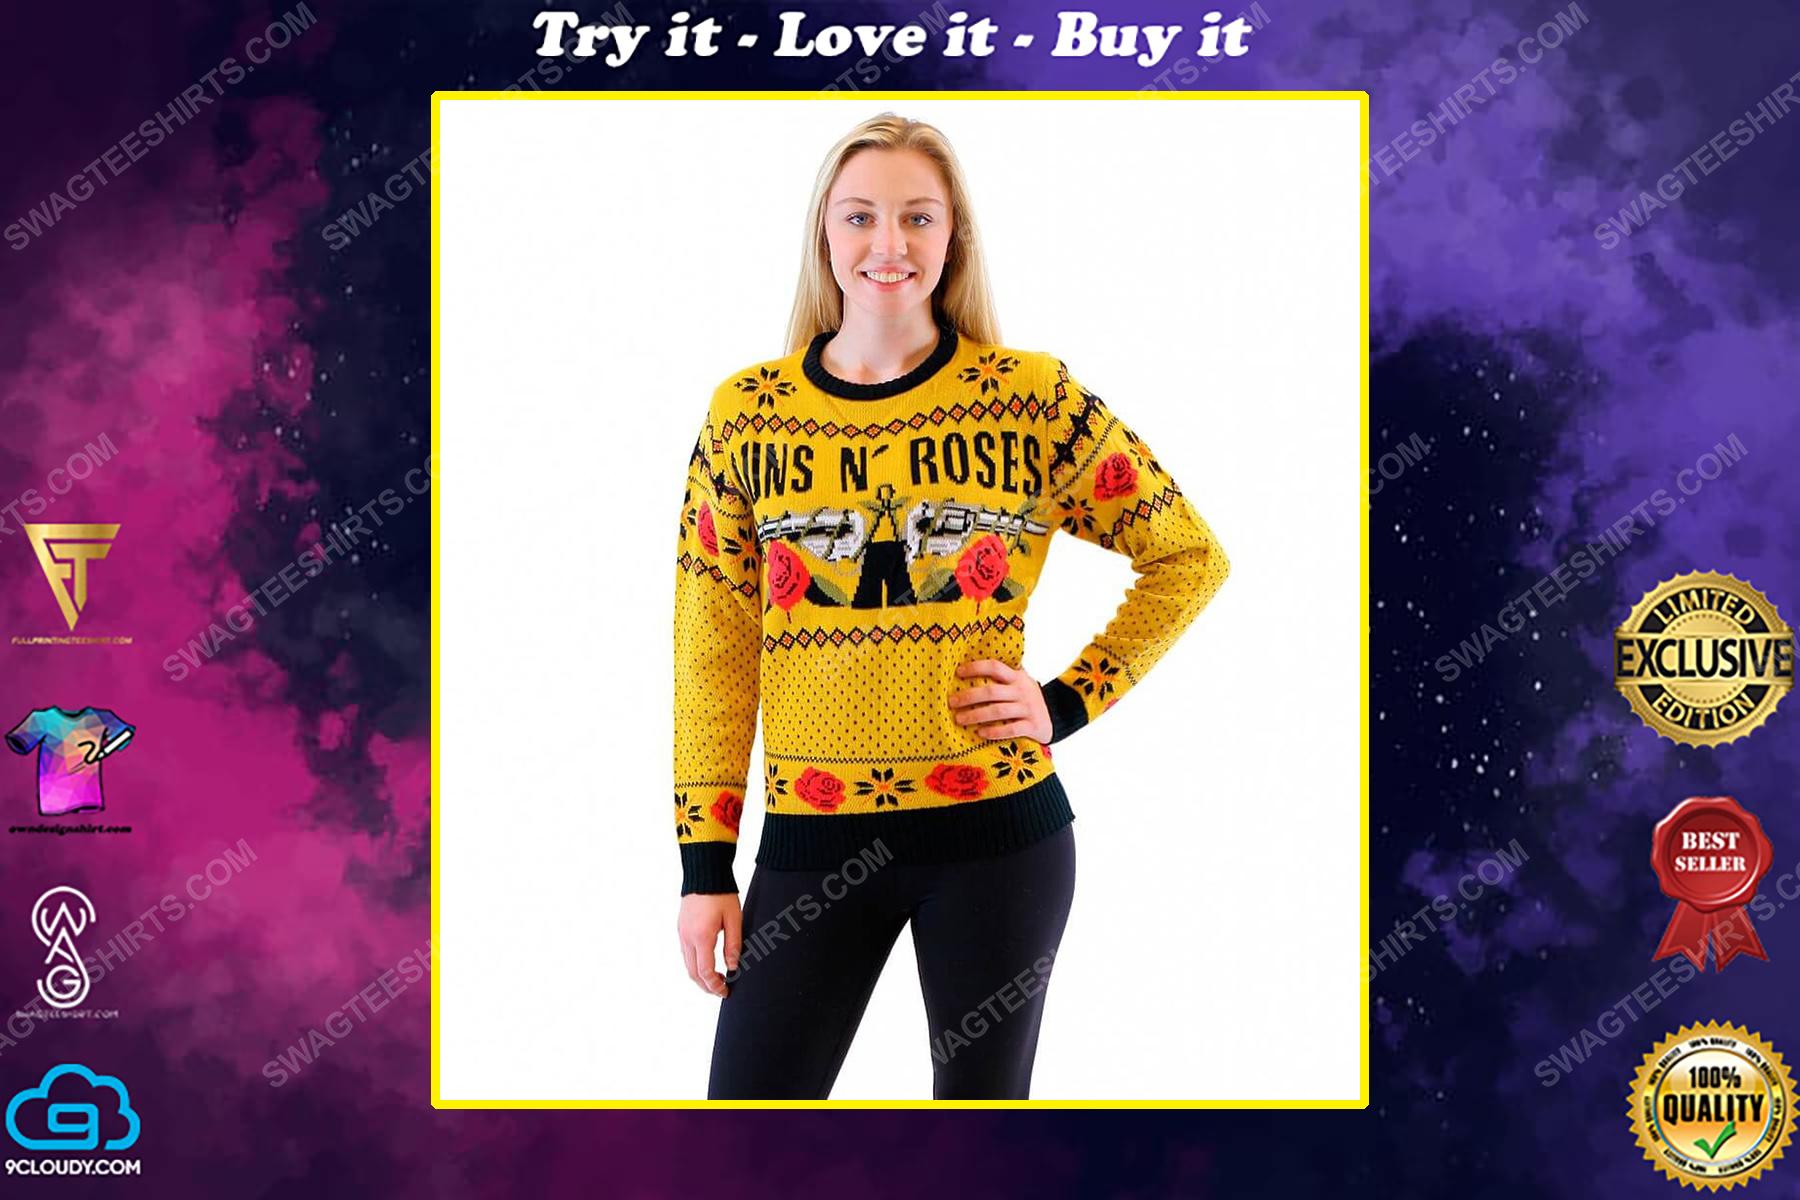 Guns n' roses rock band full print ugly christmas sweater